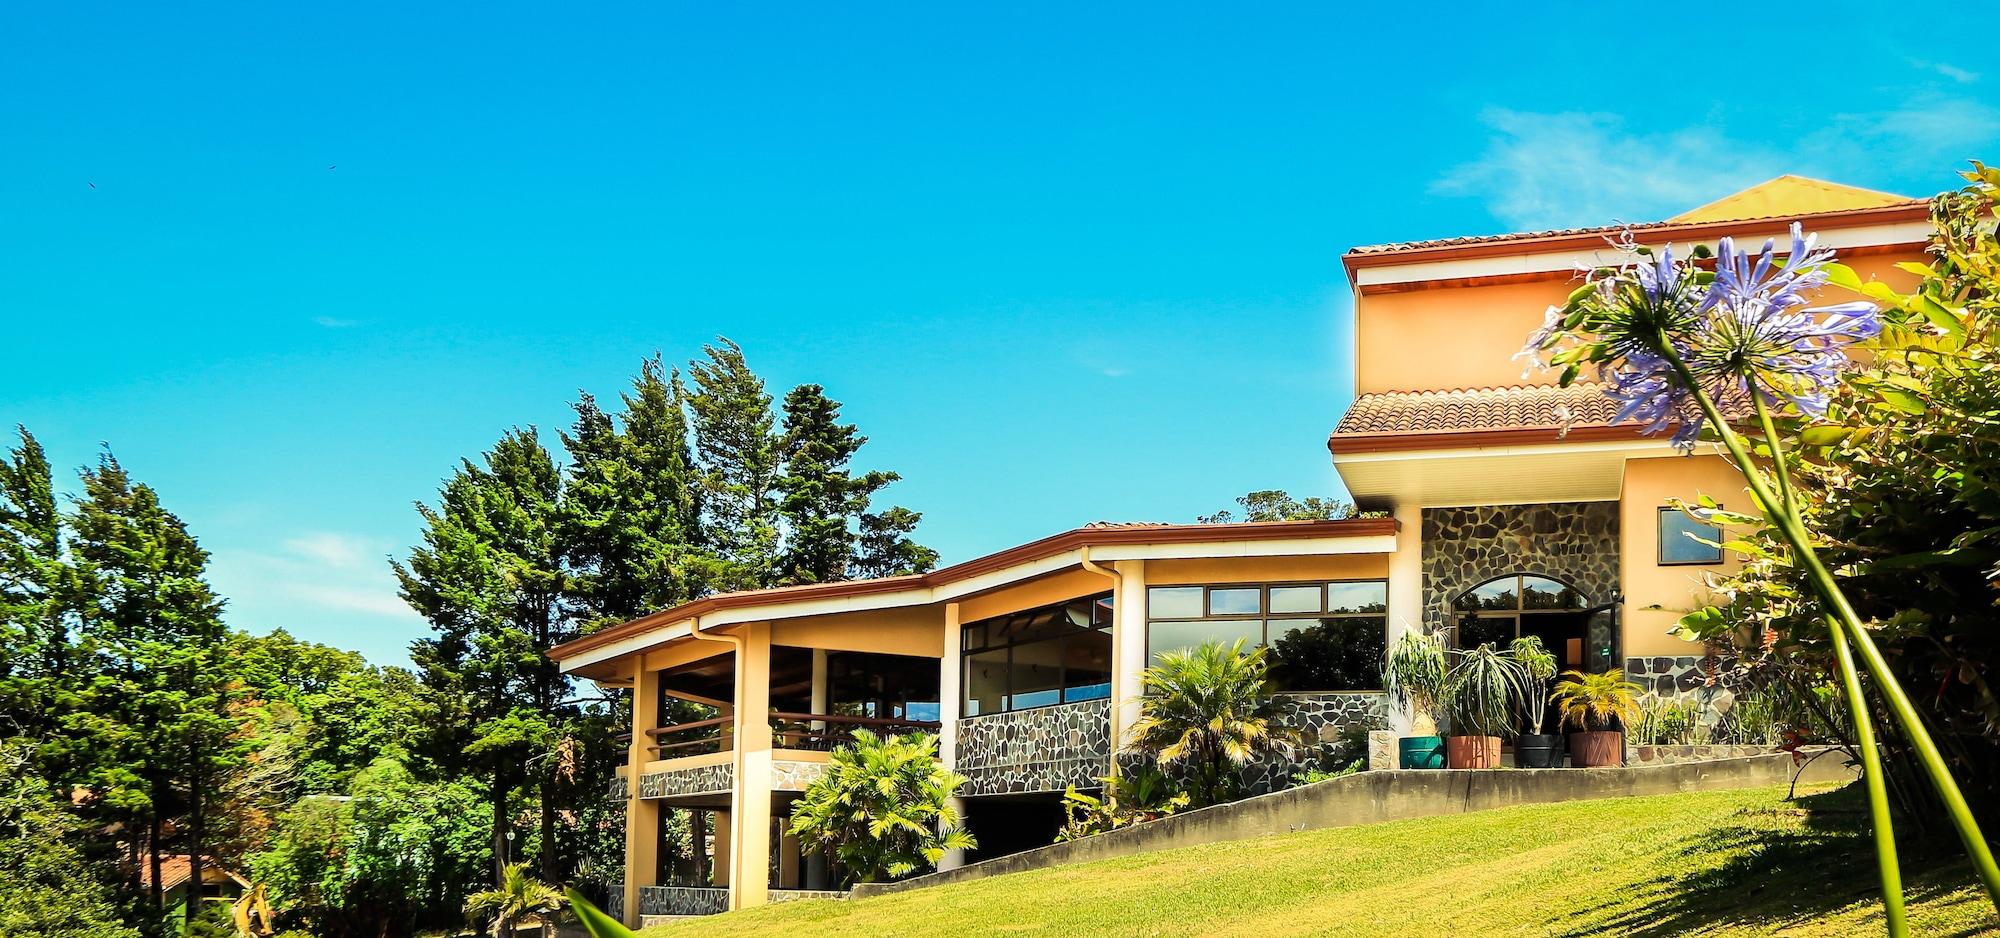 Hotel de Montana Monteverde, Puntarenas